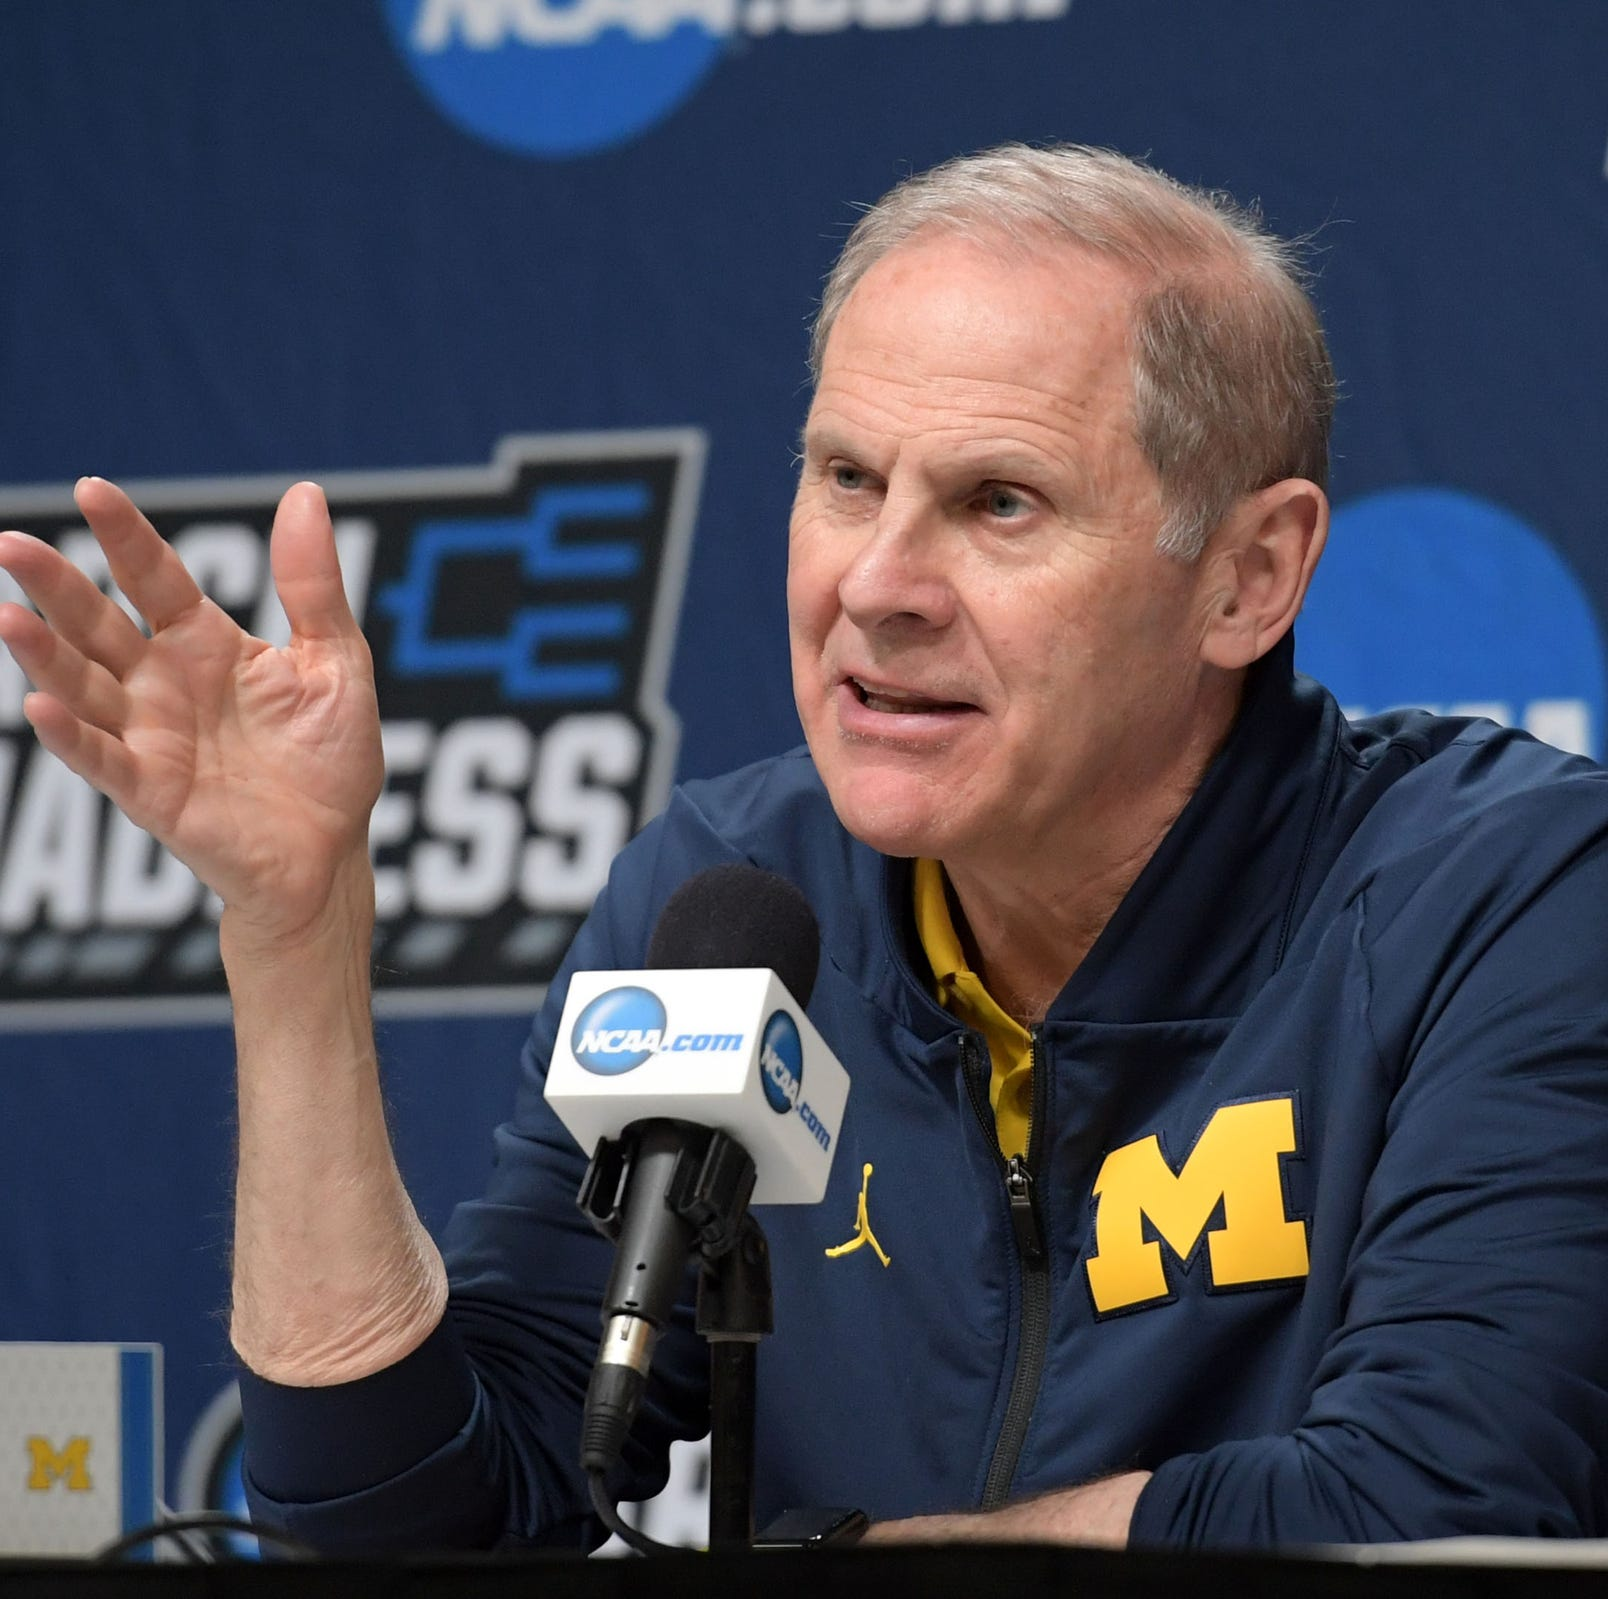 Michigan basketball: Here's what John Beilein said before NCAA tournament